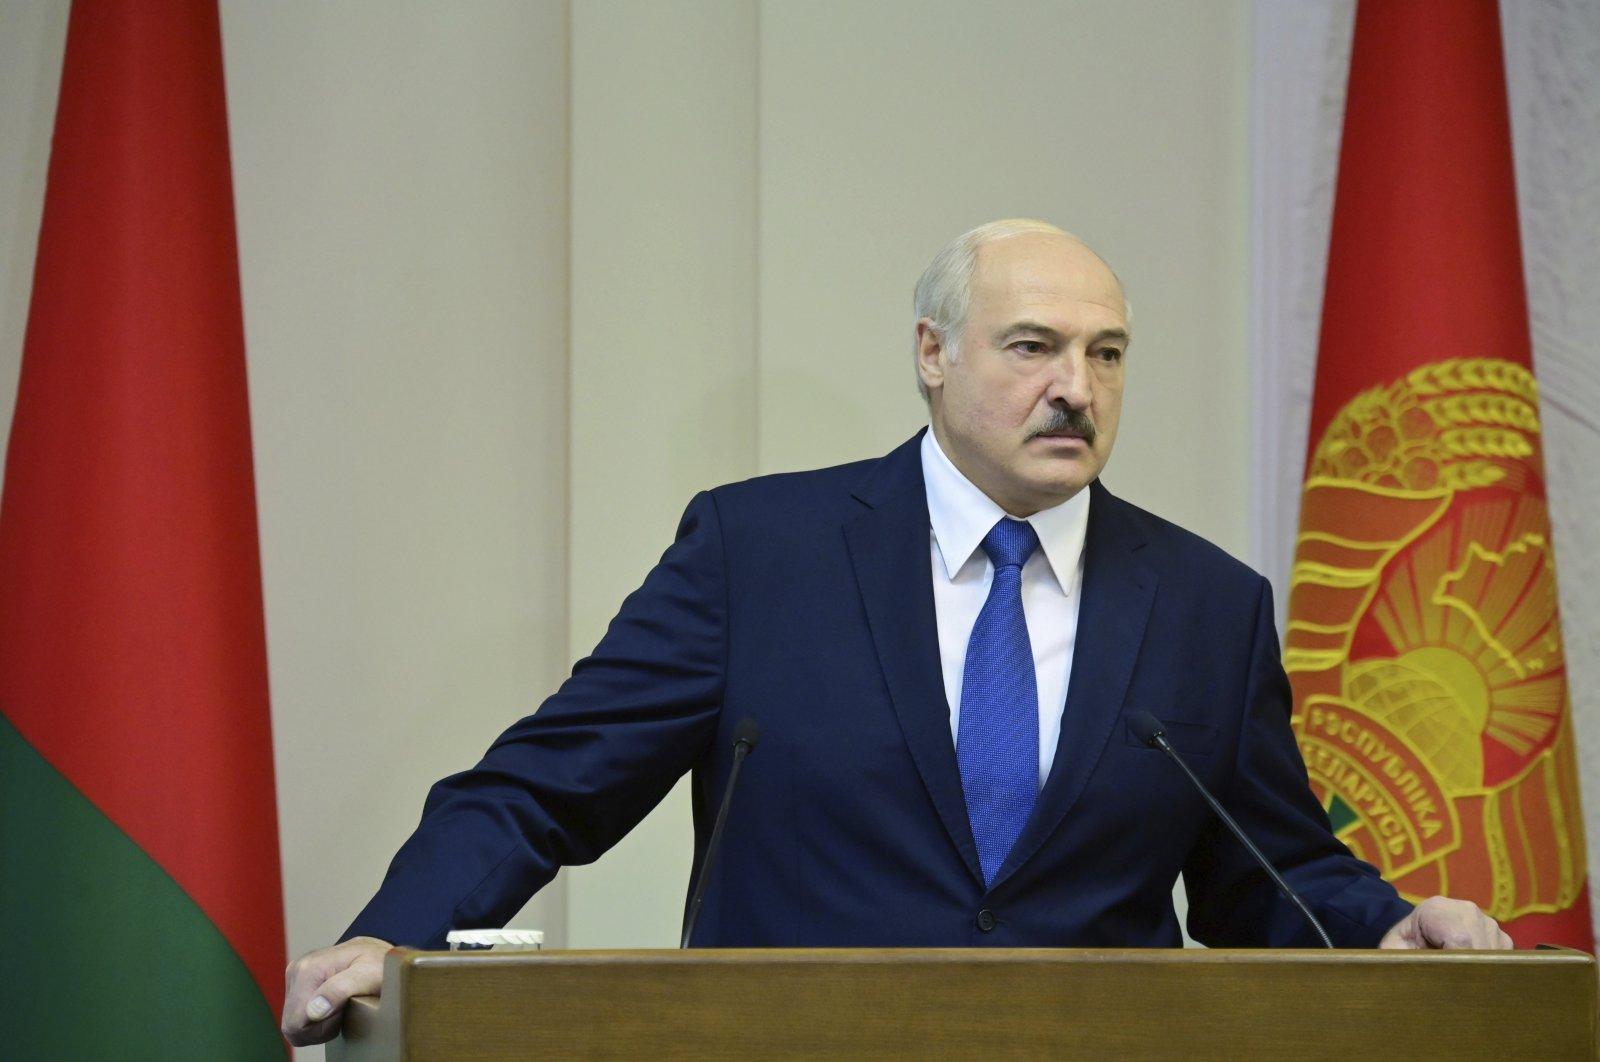 Belarusian President Alexander Lukashenko speaks during a Cabinet meeting in Minsk, Belarus, Sept. 10, 2020. (BelTA Pool Photo via AP)